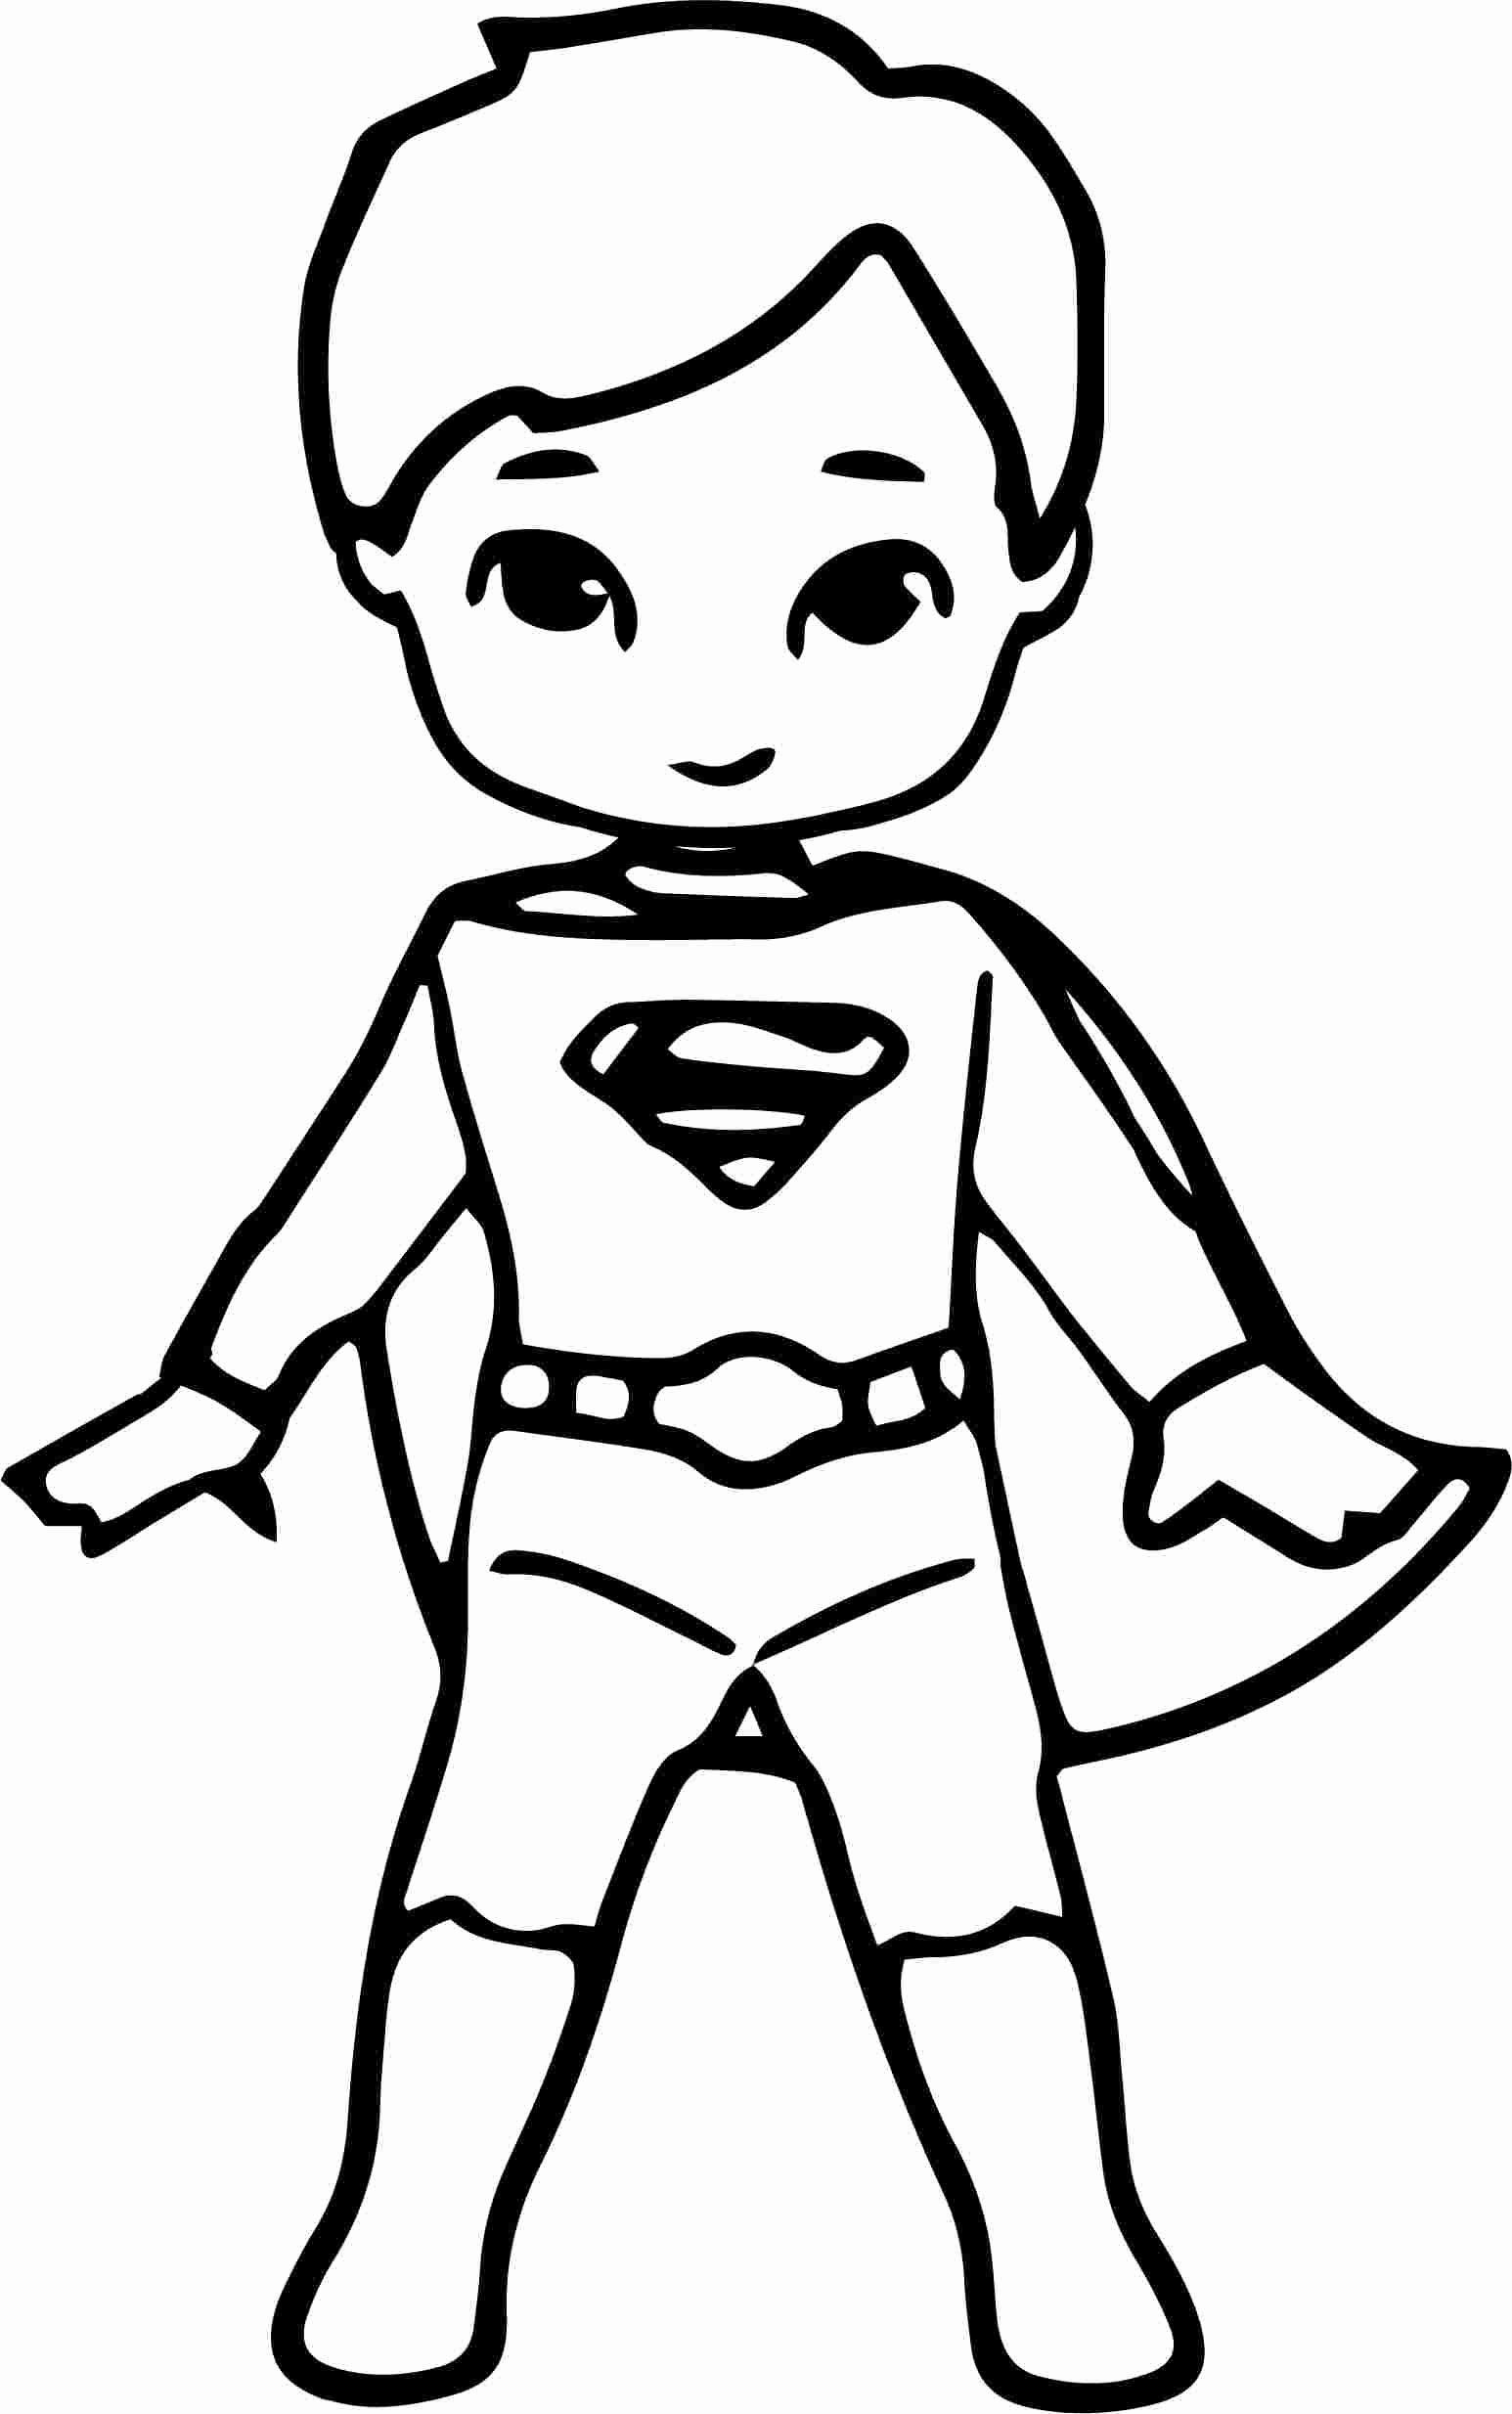 Superhero Kids Coloring Pages In 2020 Superhero Coloring Superhero Coloring Pages Superman Coloring Pages